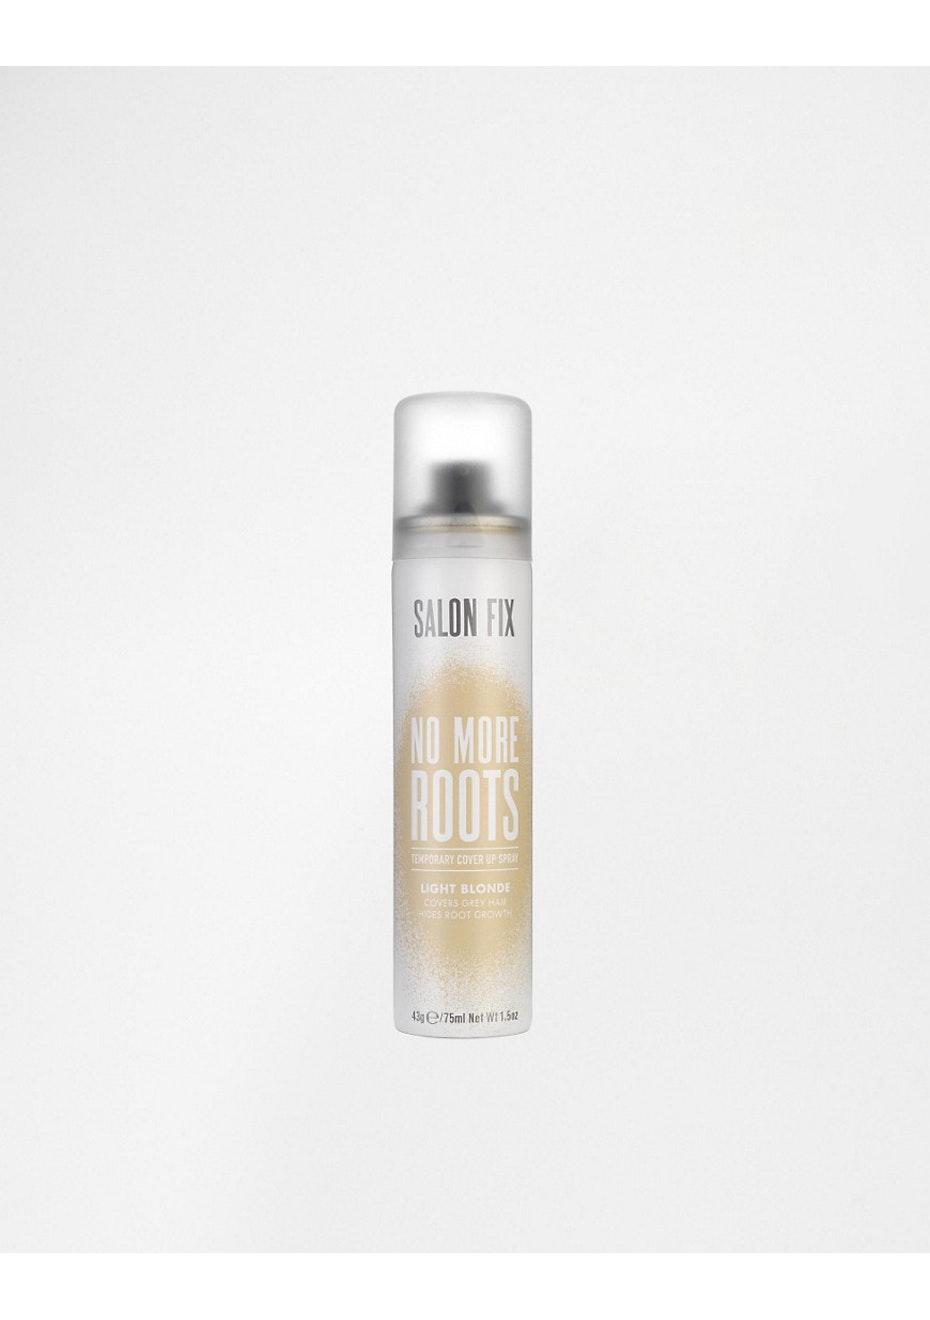 Salon Fix No More Roots Spray Light Blonde 75ml